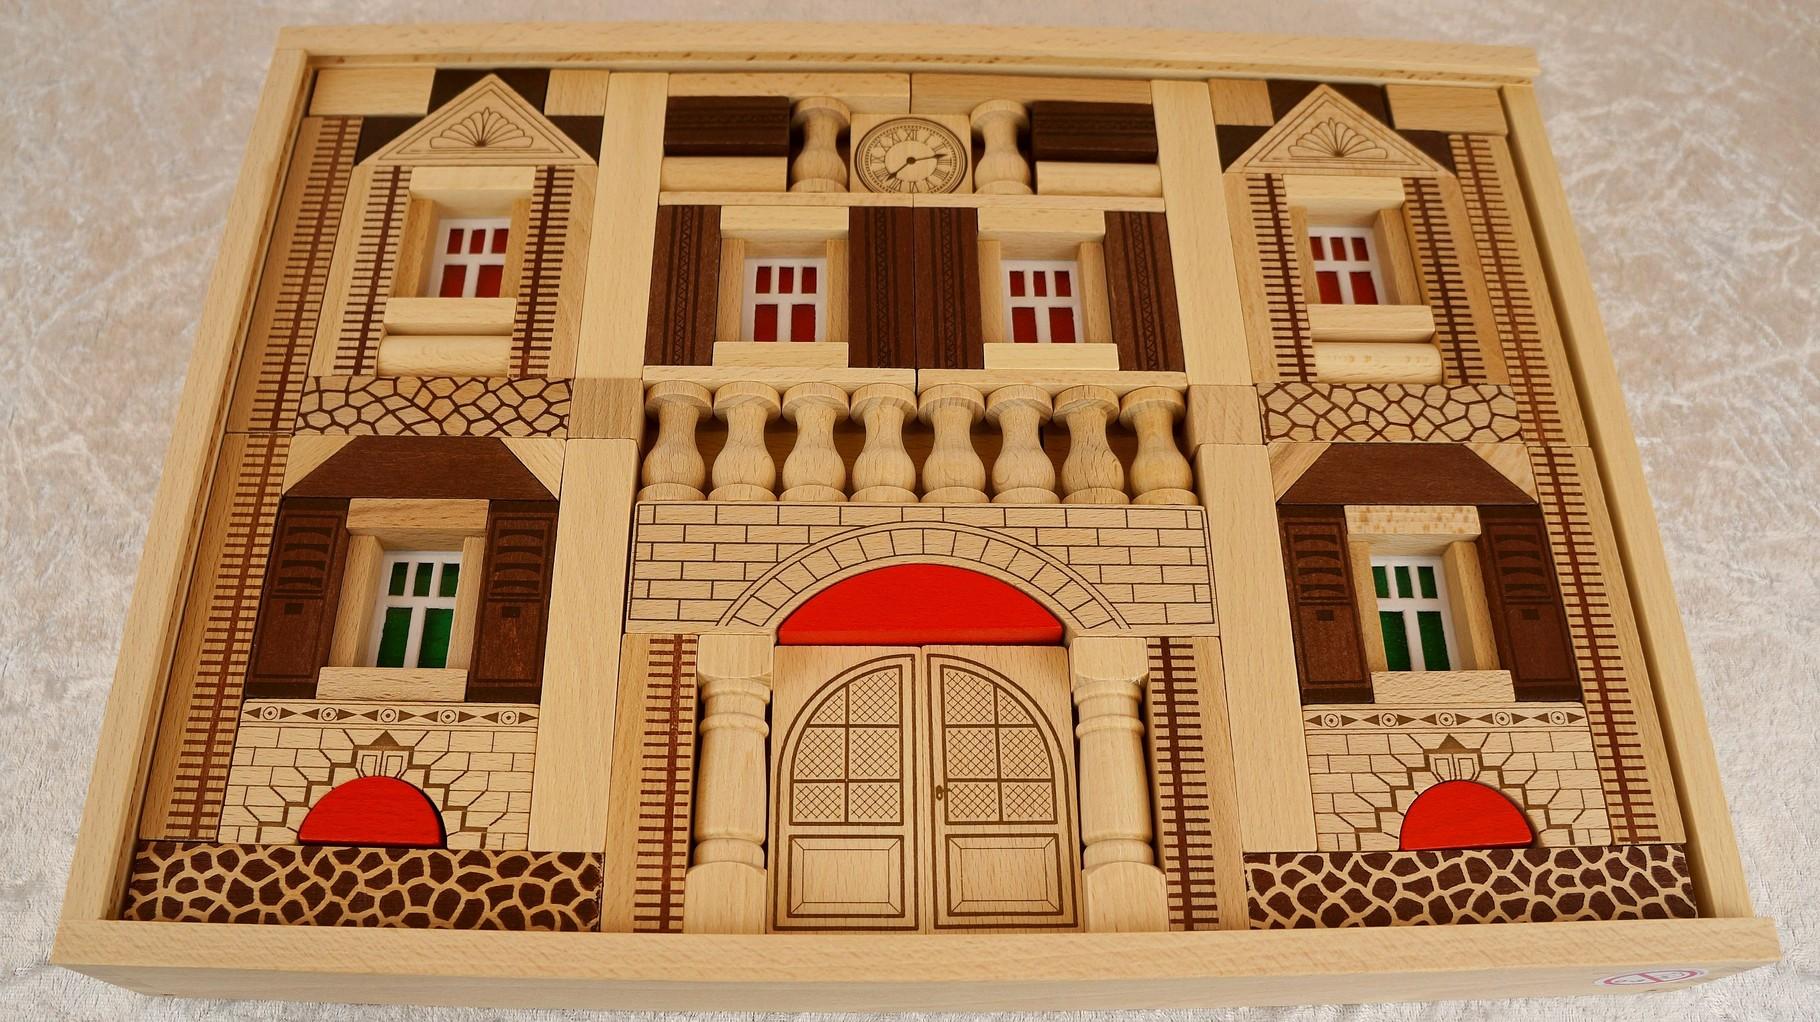 brettspiel hnefatafl tablut spielmannshof seitenroda. Black Bedroom Furniture Sets. Home Design Ideas